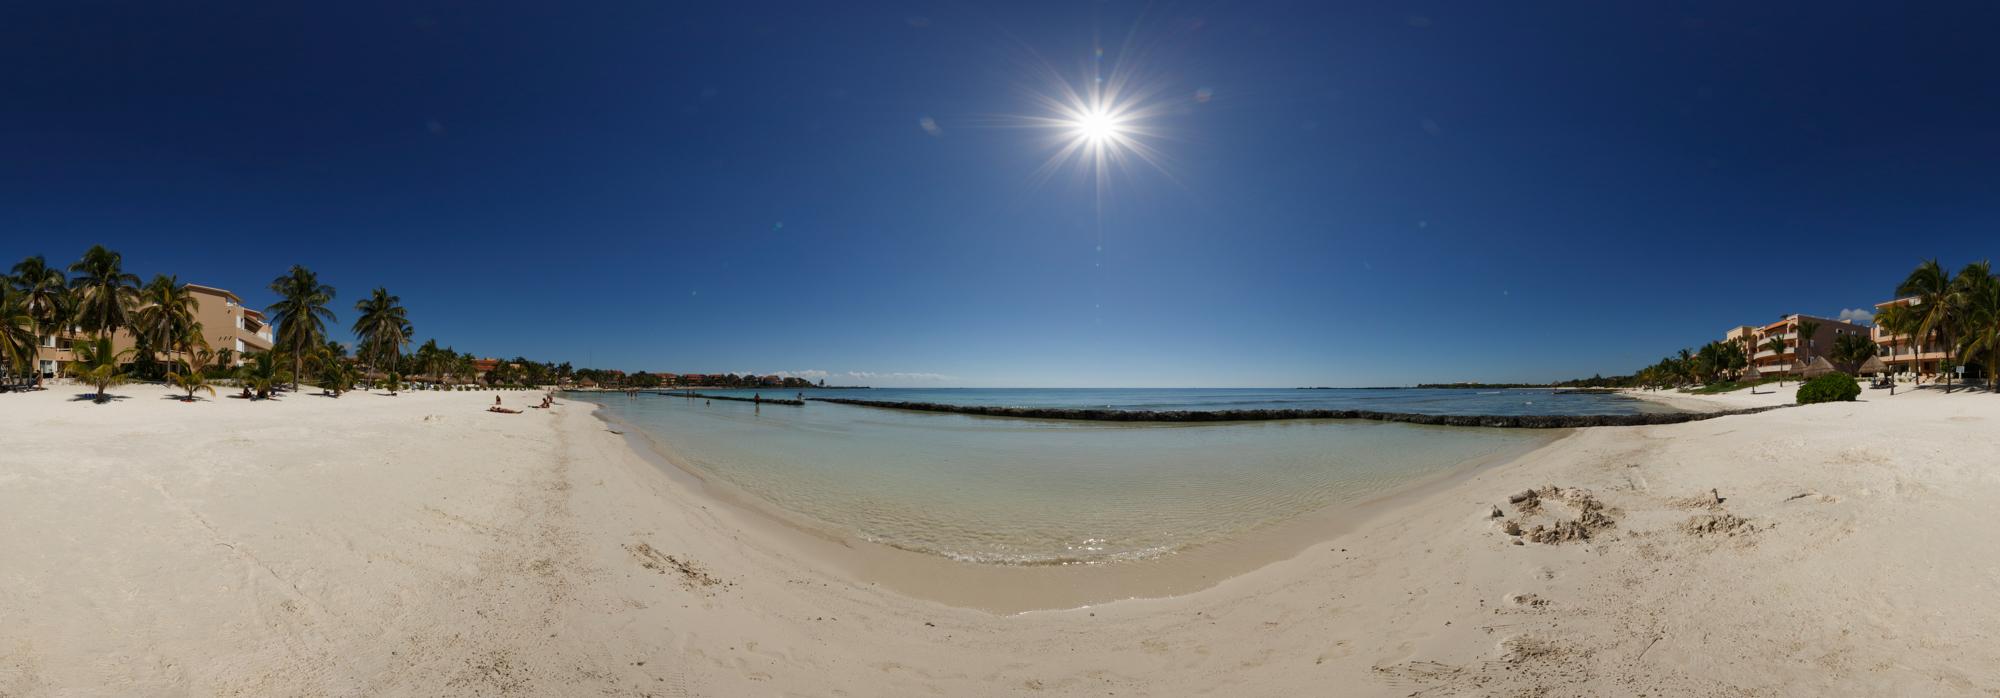 Puerto Aventuras Omni Beach Club